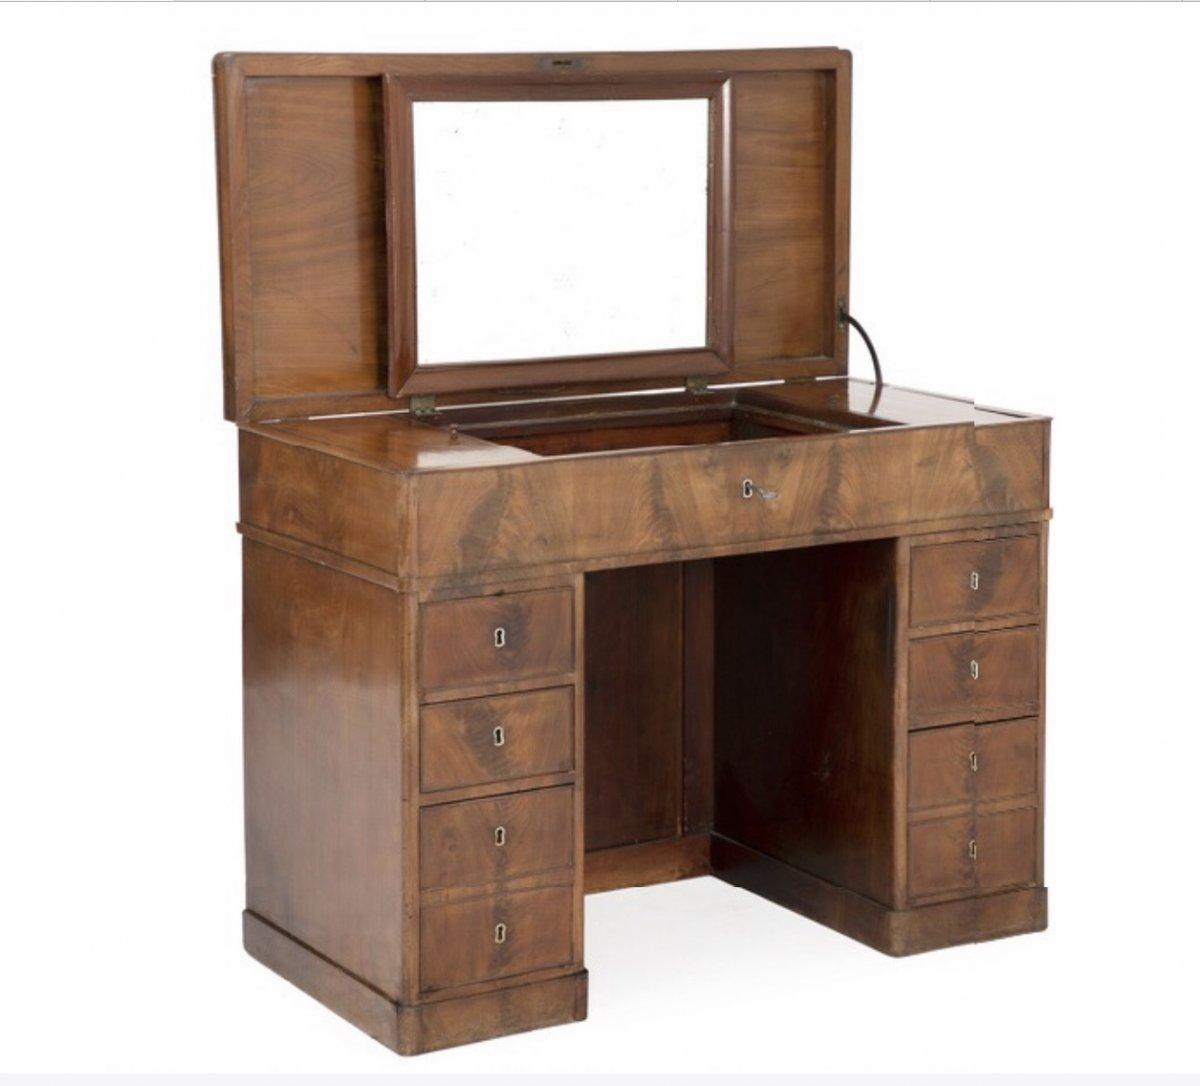 Gentelman's Desk-dressing Table In Light Mahogany For Handsome Interior